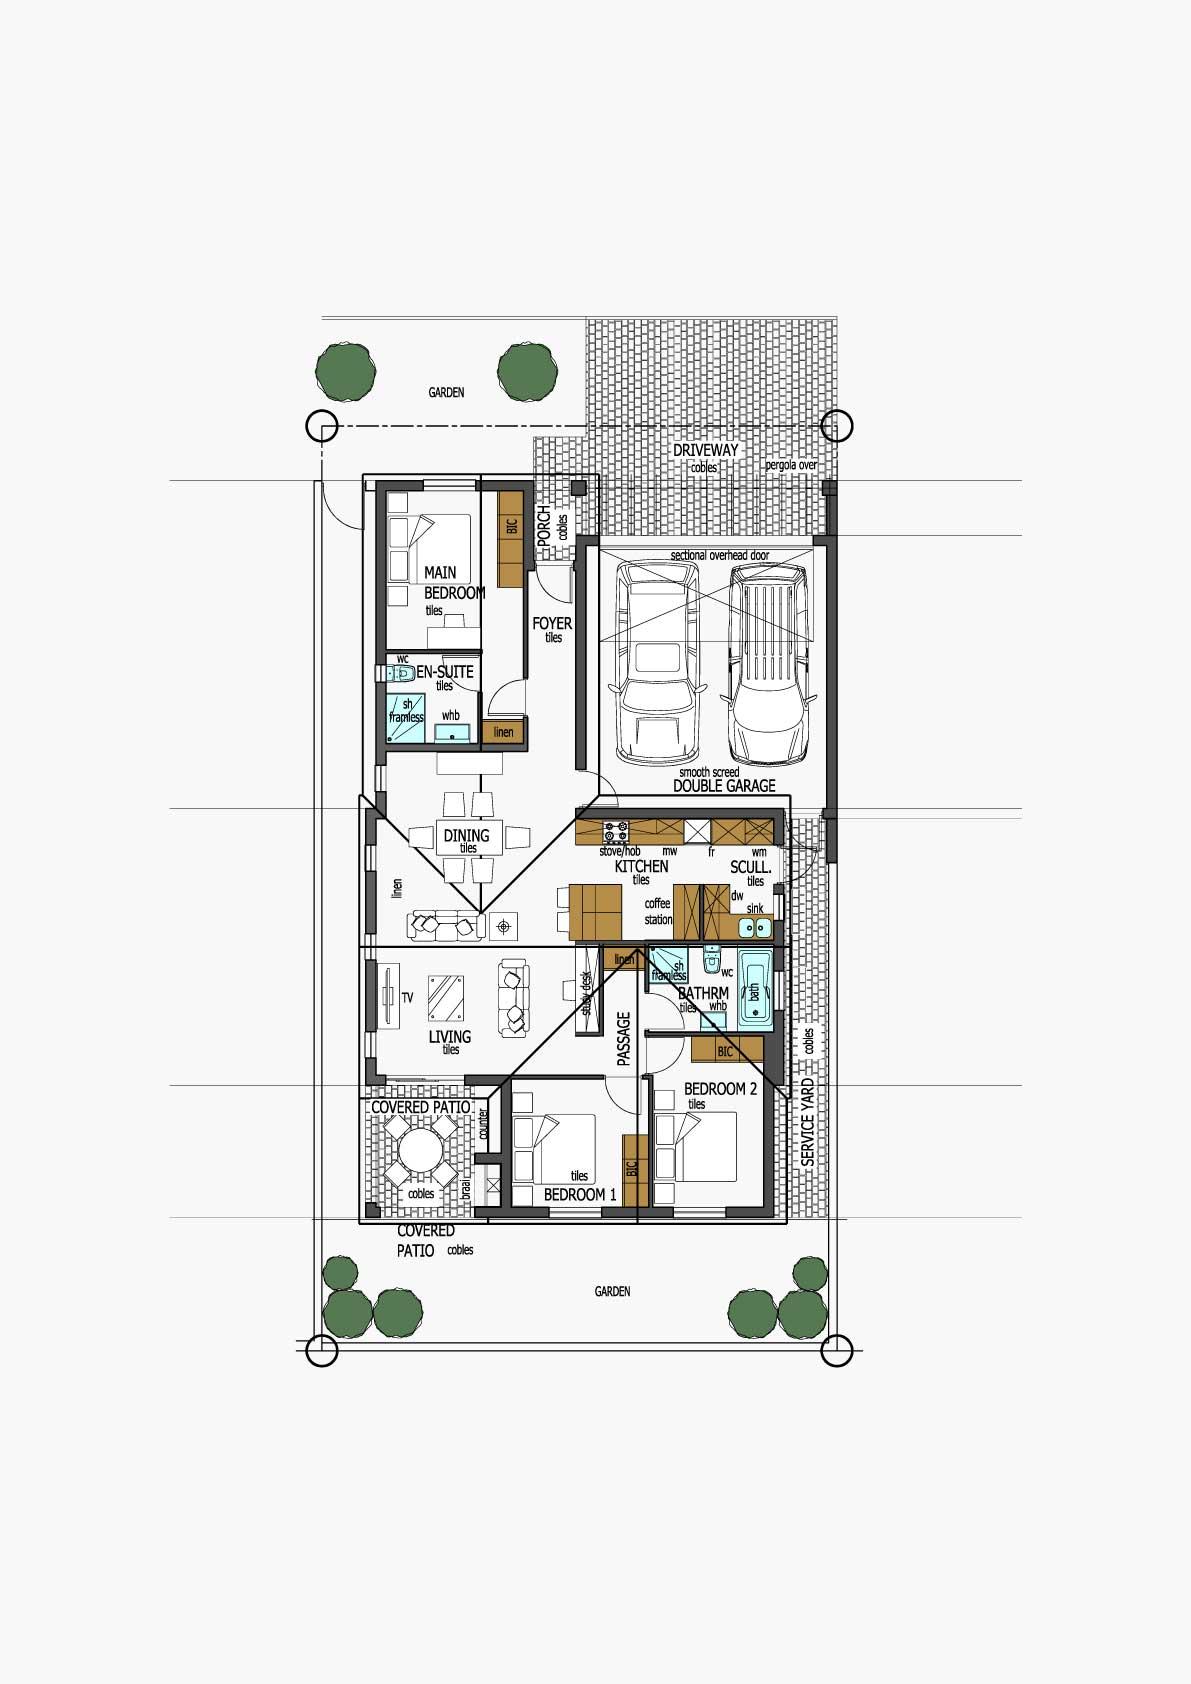 Homes Unit Layout - Type B